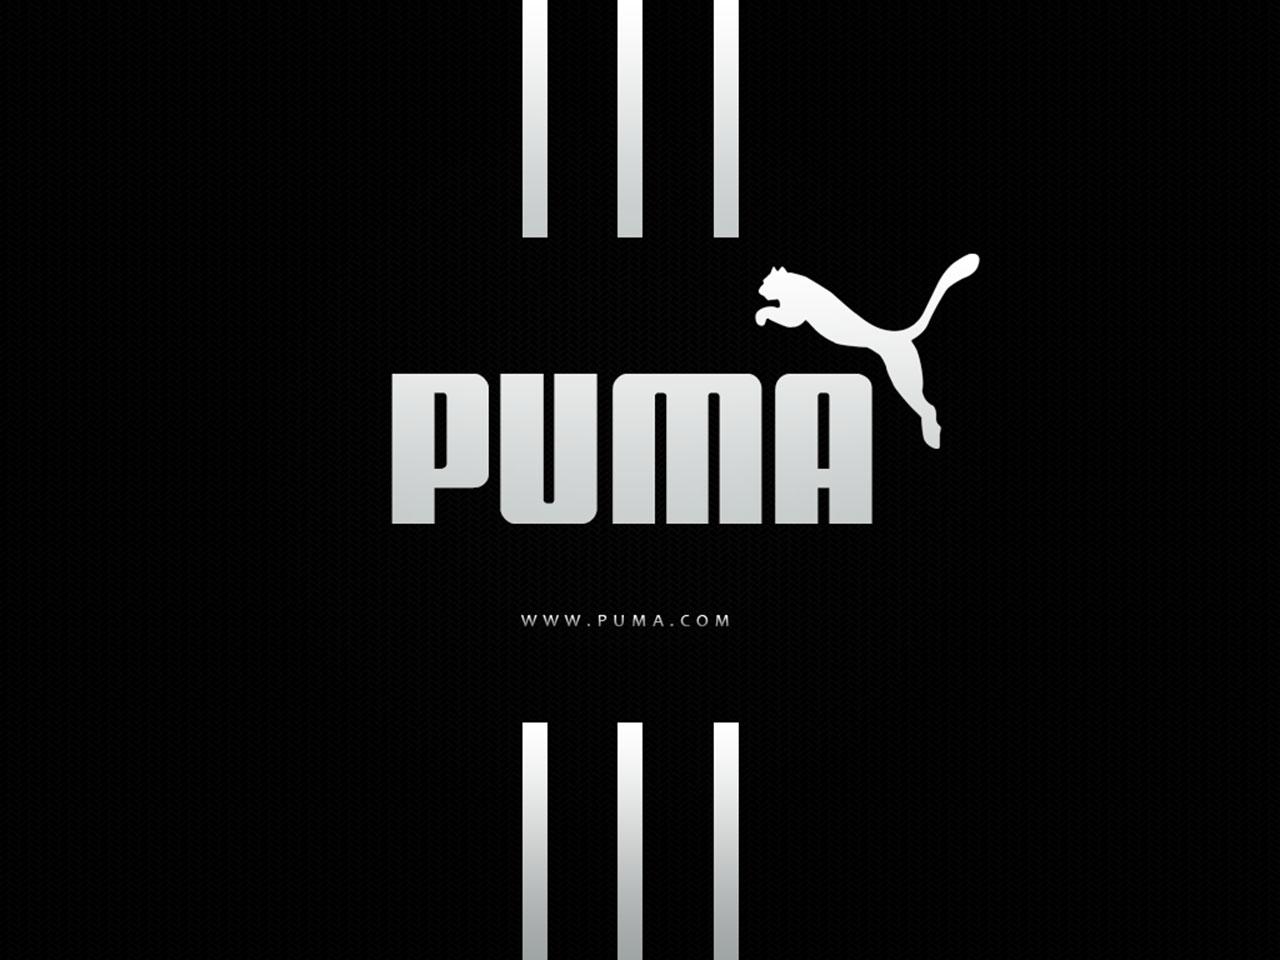 the phone will boot up by a black puma logo: xperianeoldev.blogspot.com/2013/05/puma-black-bootanimation.html